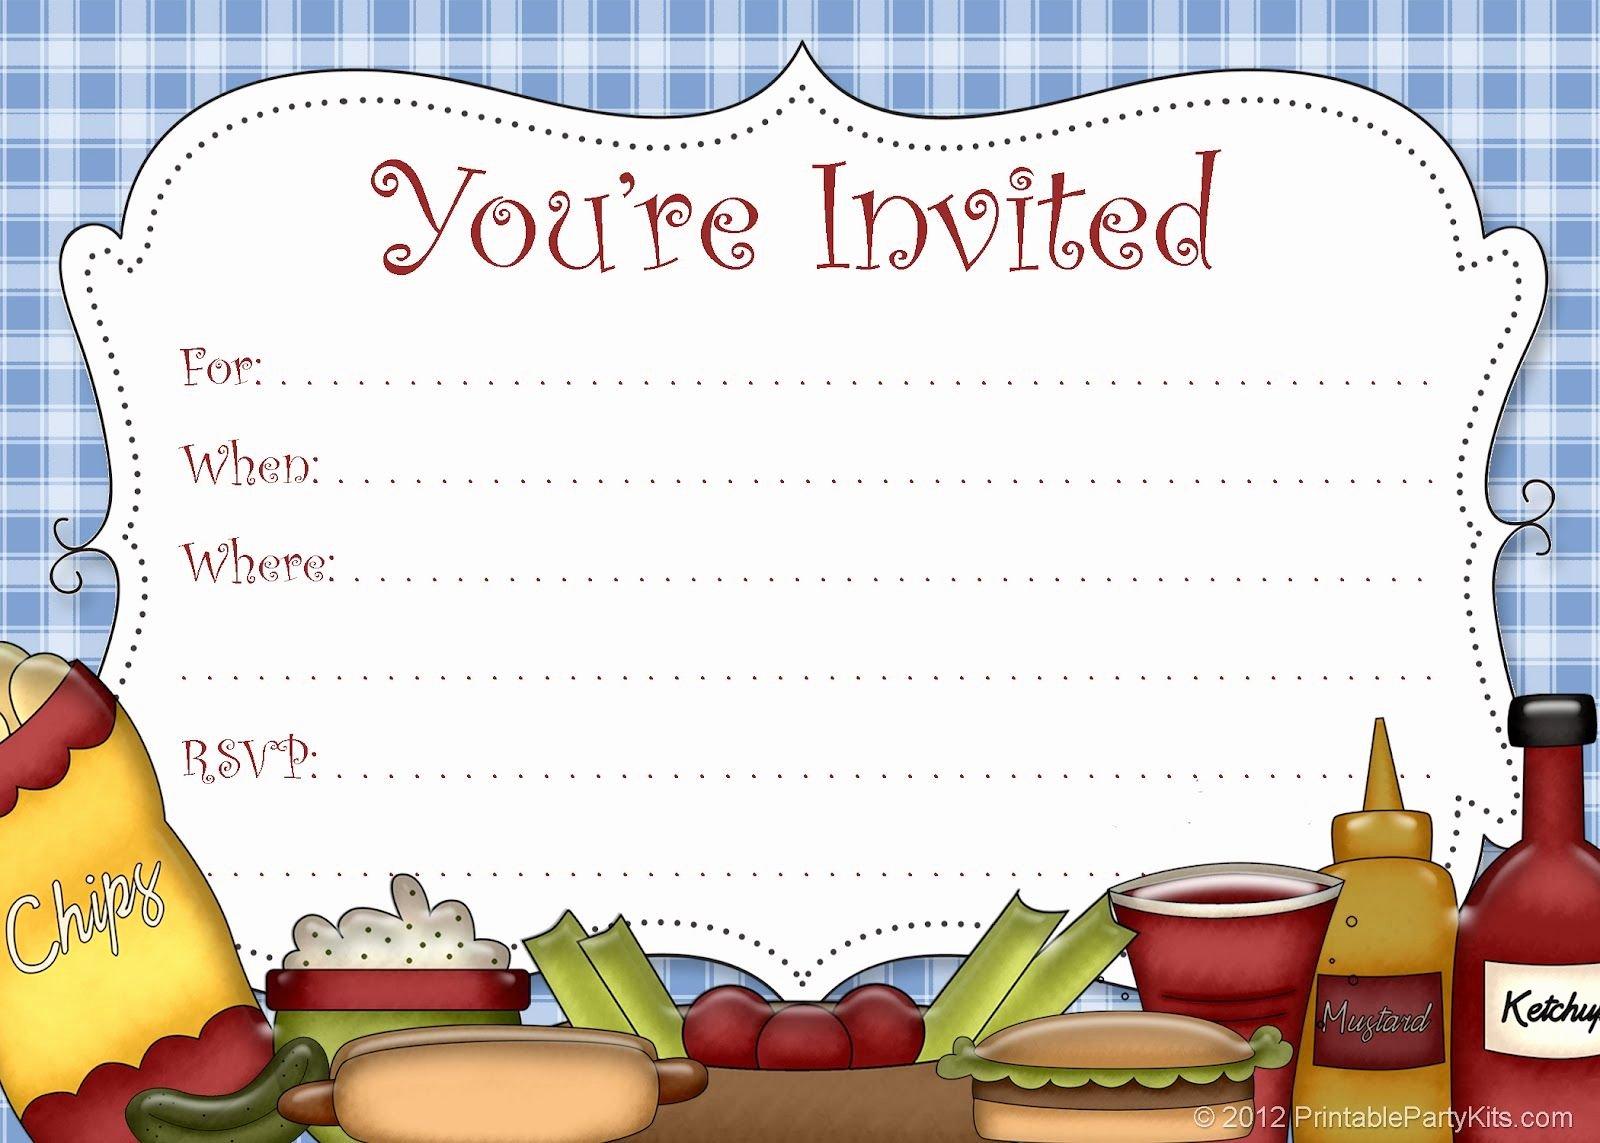 Picnic Invitation Templates Free Beautiful Free Printable Picnic Invitation